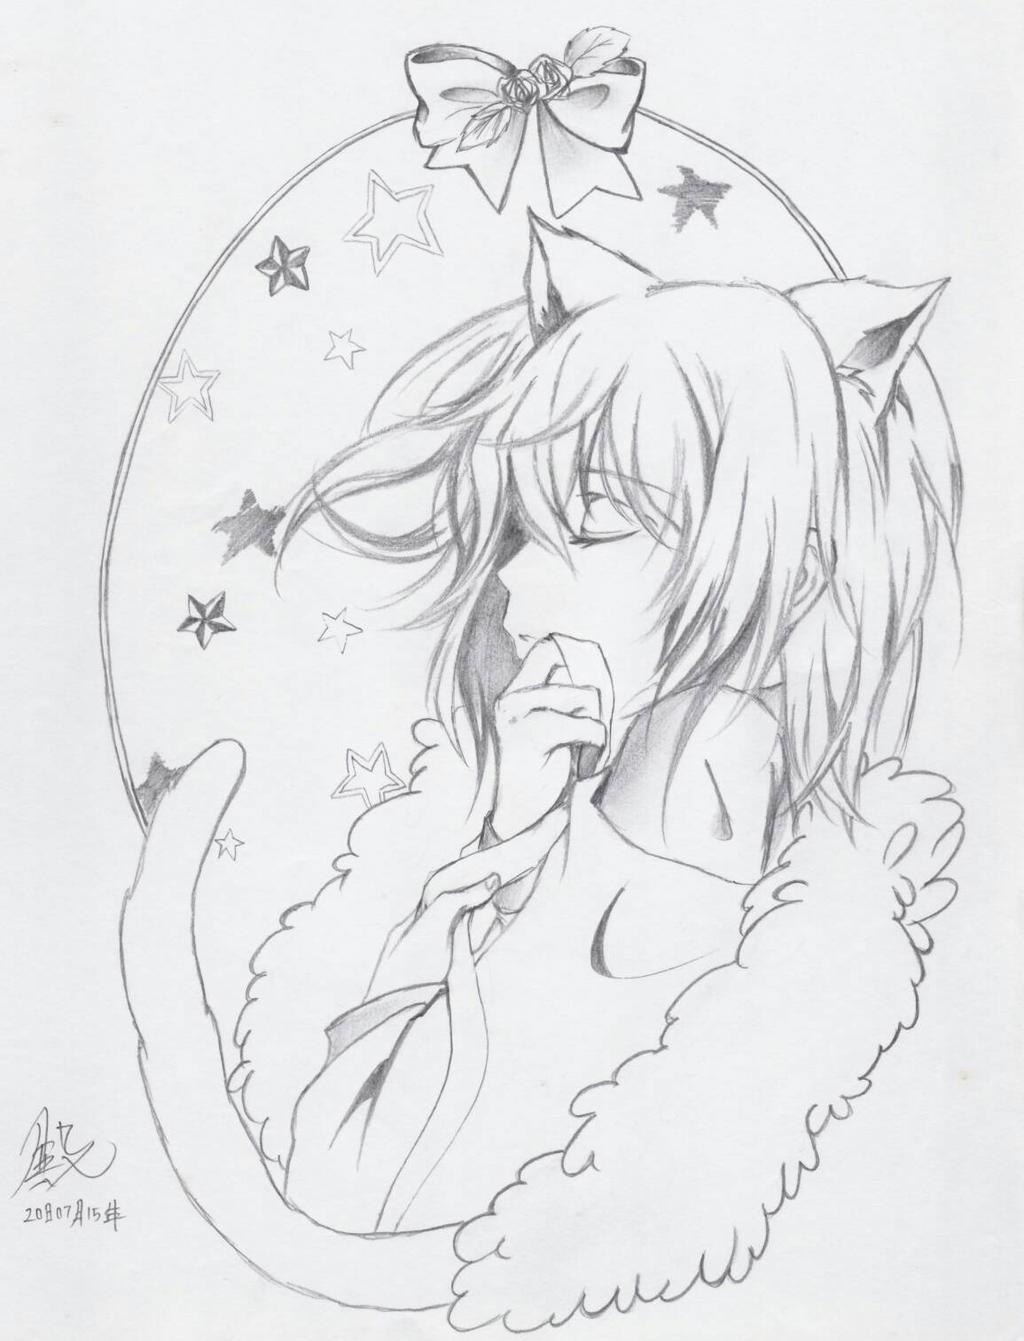 Loveless - Aoyagi Ritsuka by Shiratorri